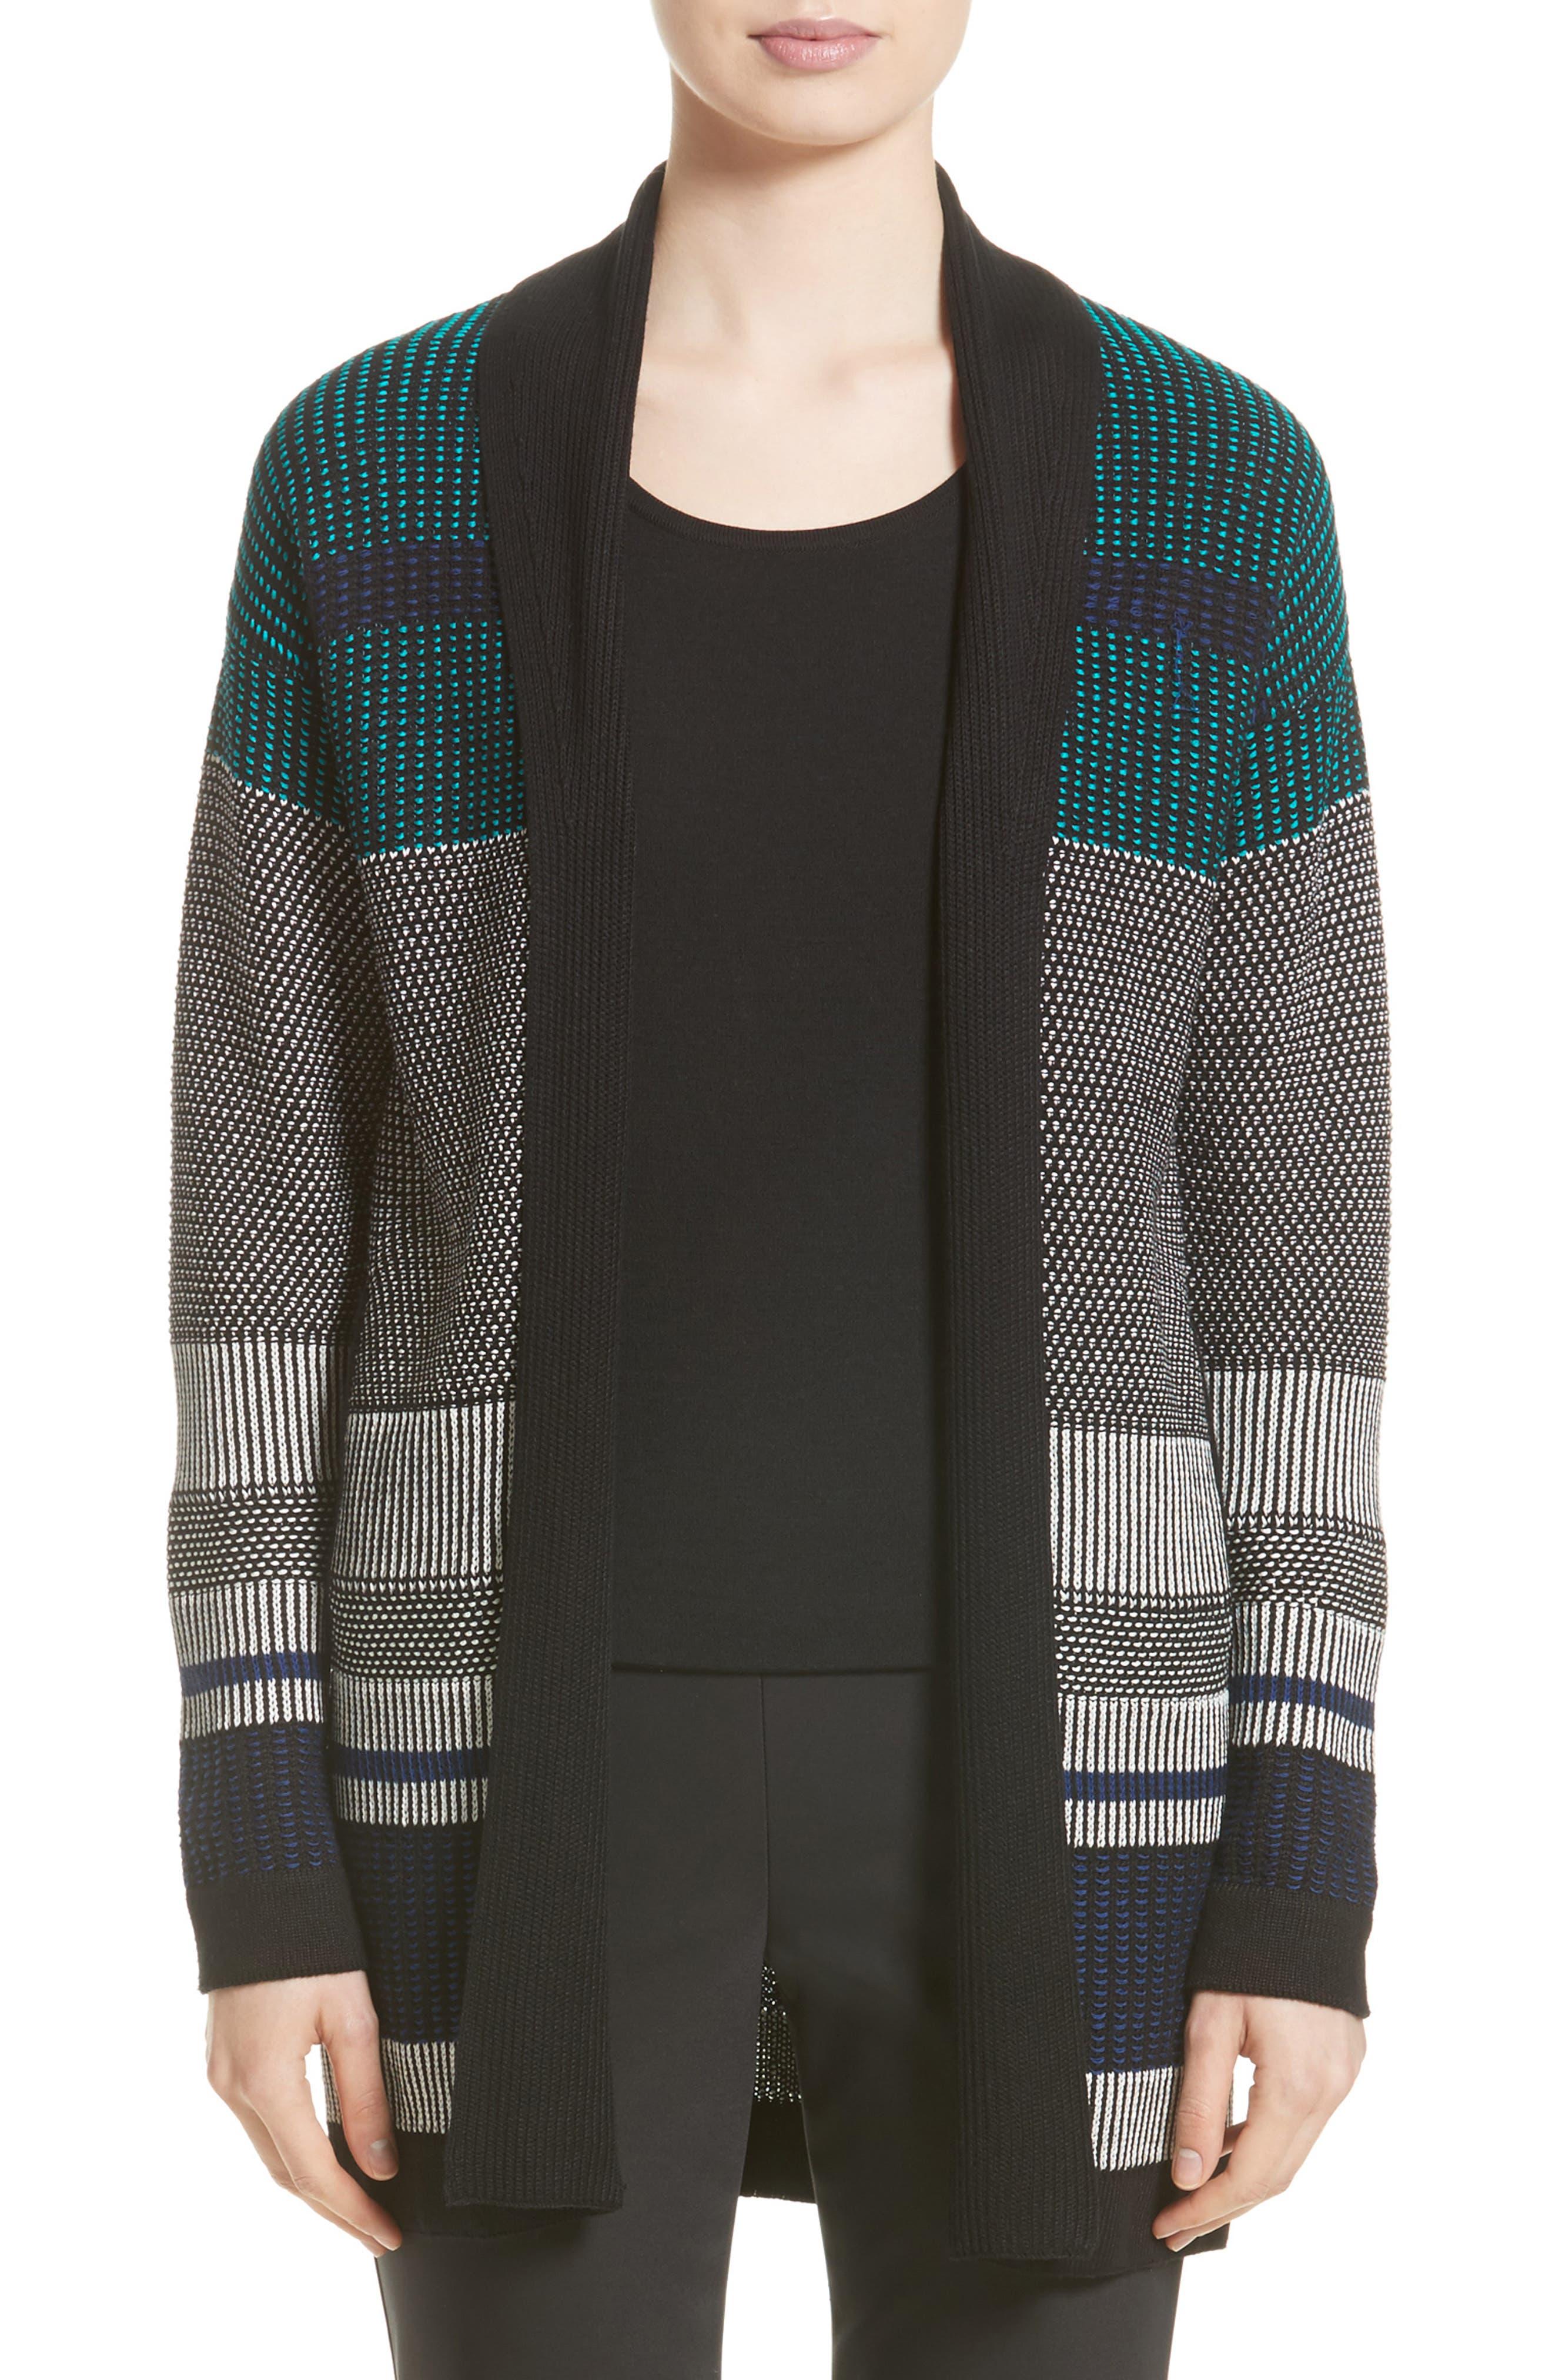 Engineered Inlay Stitch Knit Cardigan,                         Main,                         color, 020